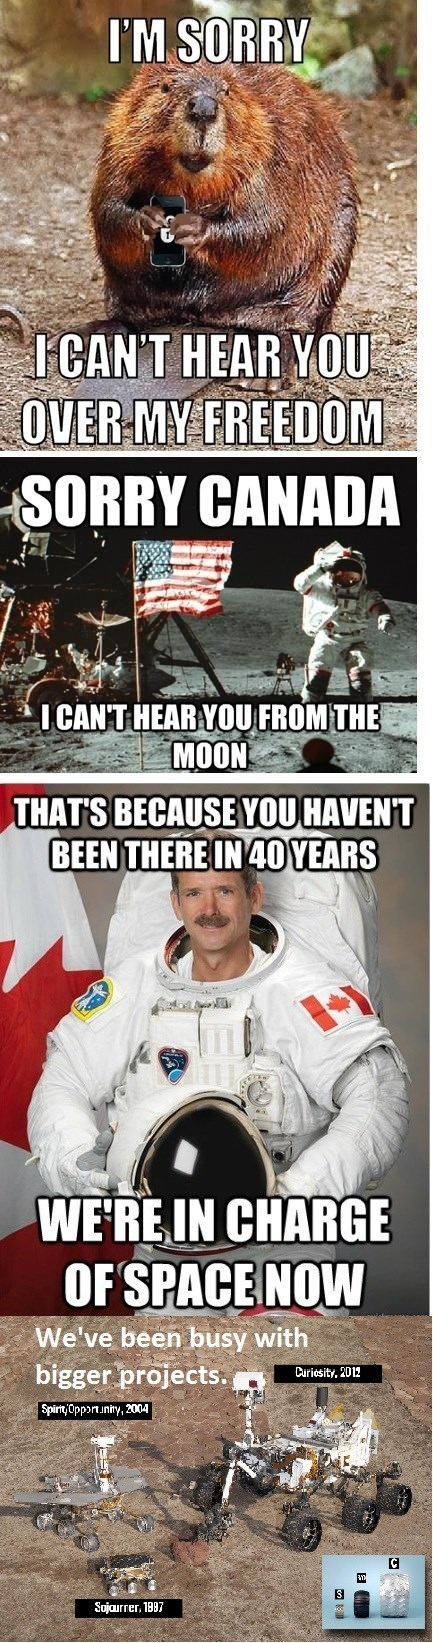 Canada,america,funny,space